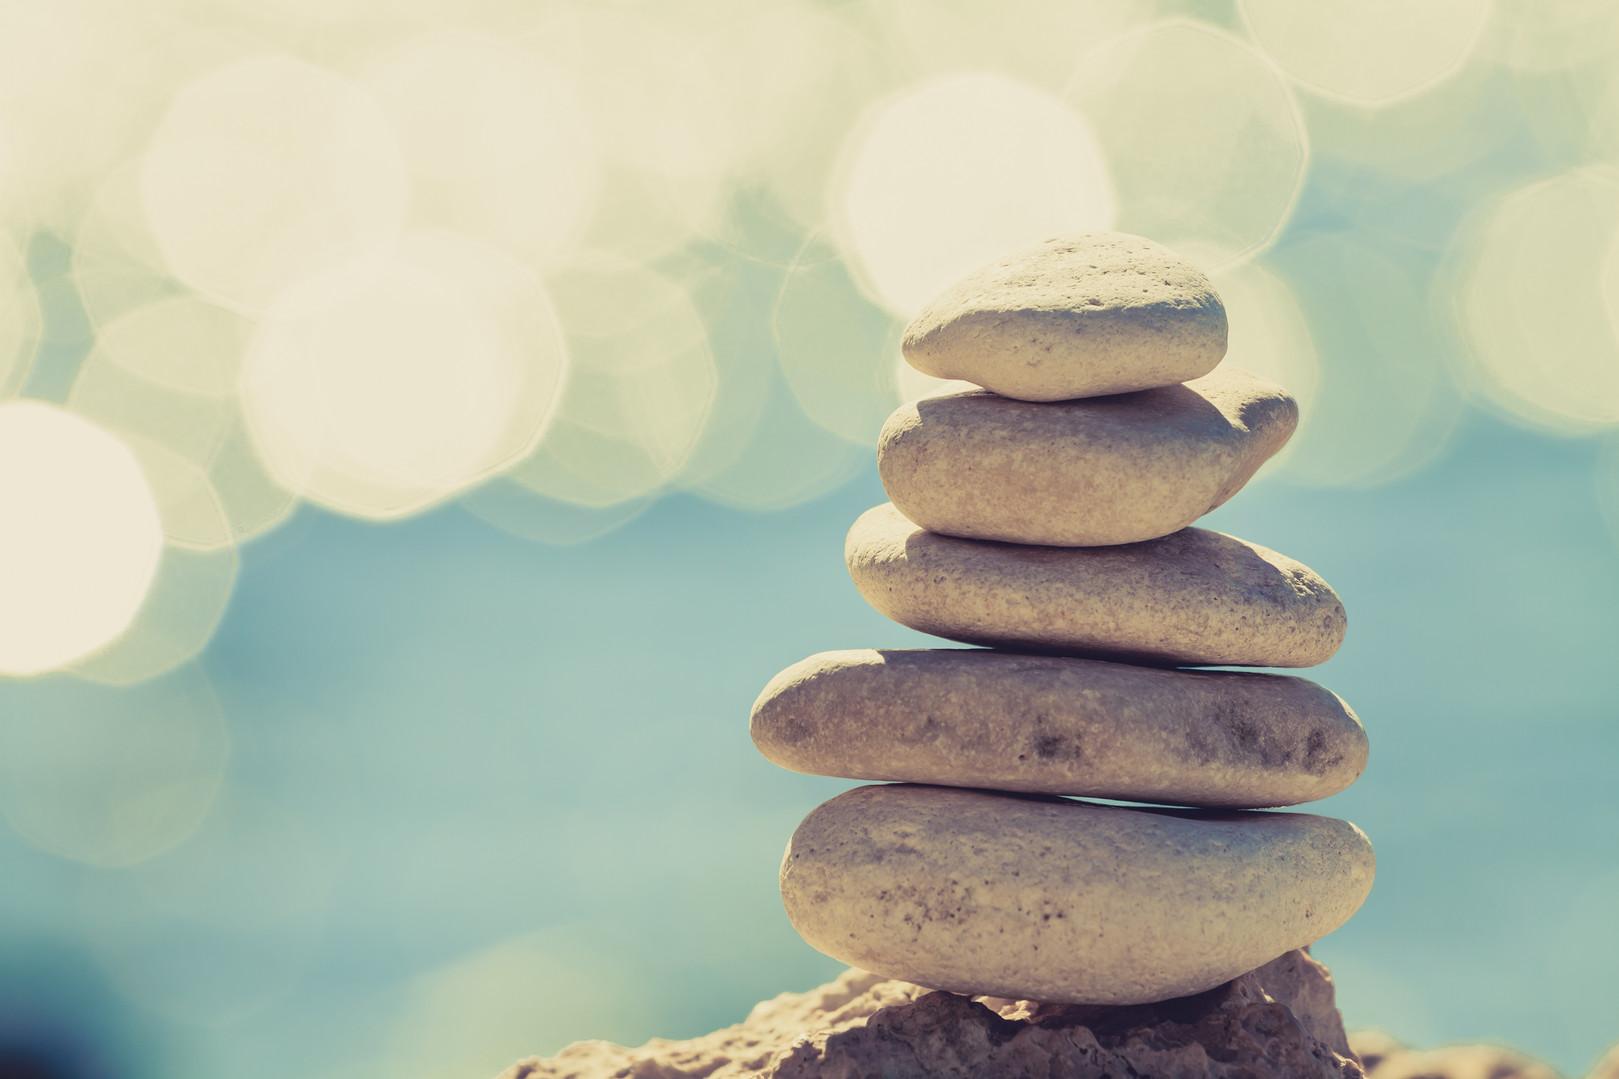 Stones balance at the vintage beach, ins